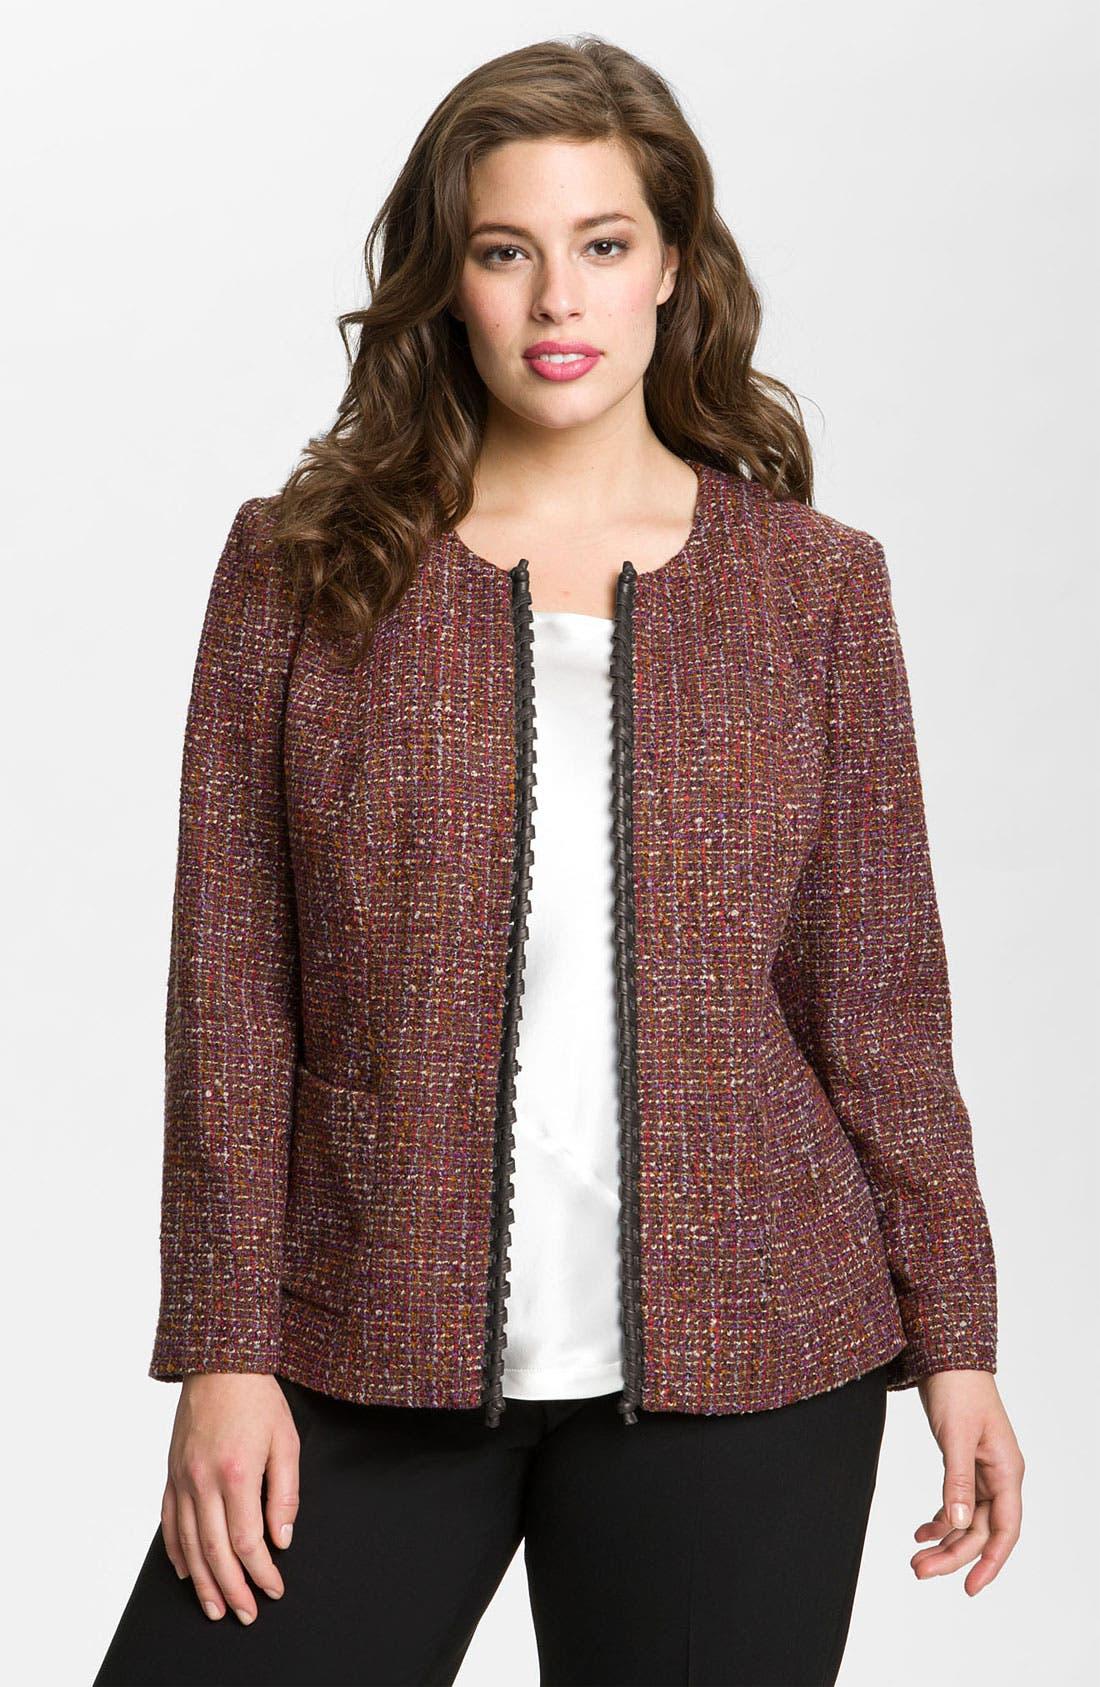 Alternate Image 1 Selected - Lafayette 148 New York 'Meyer' Leather Trim Tweed Jacket (Plus)